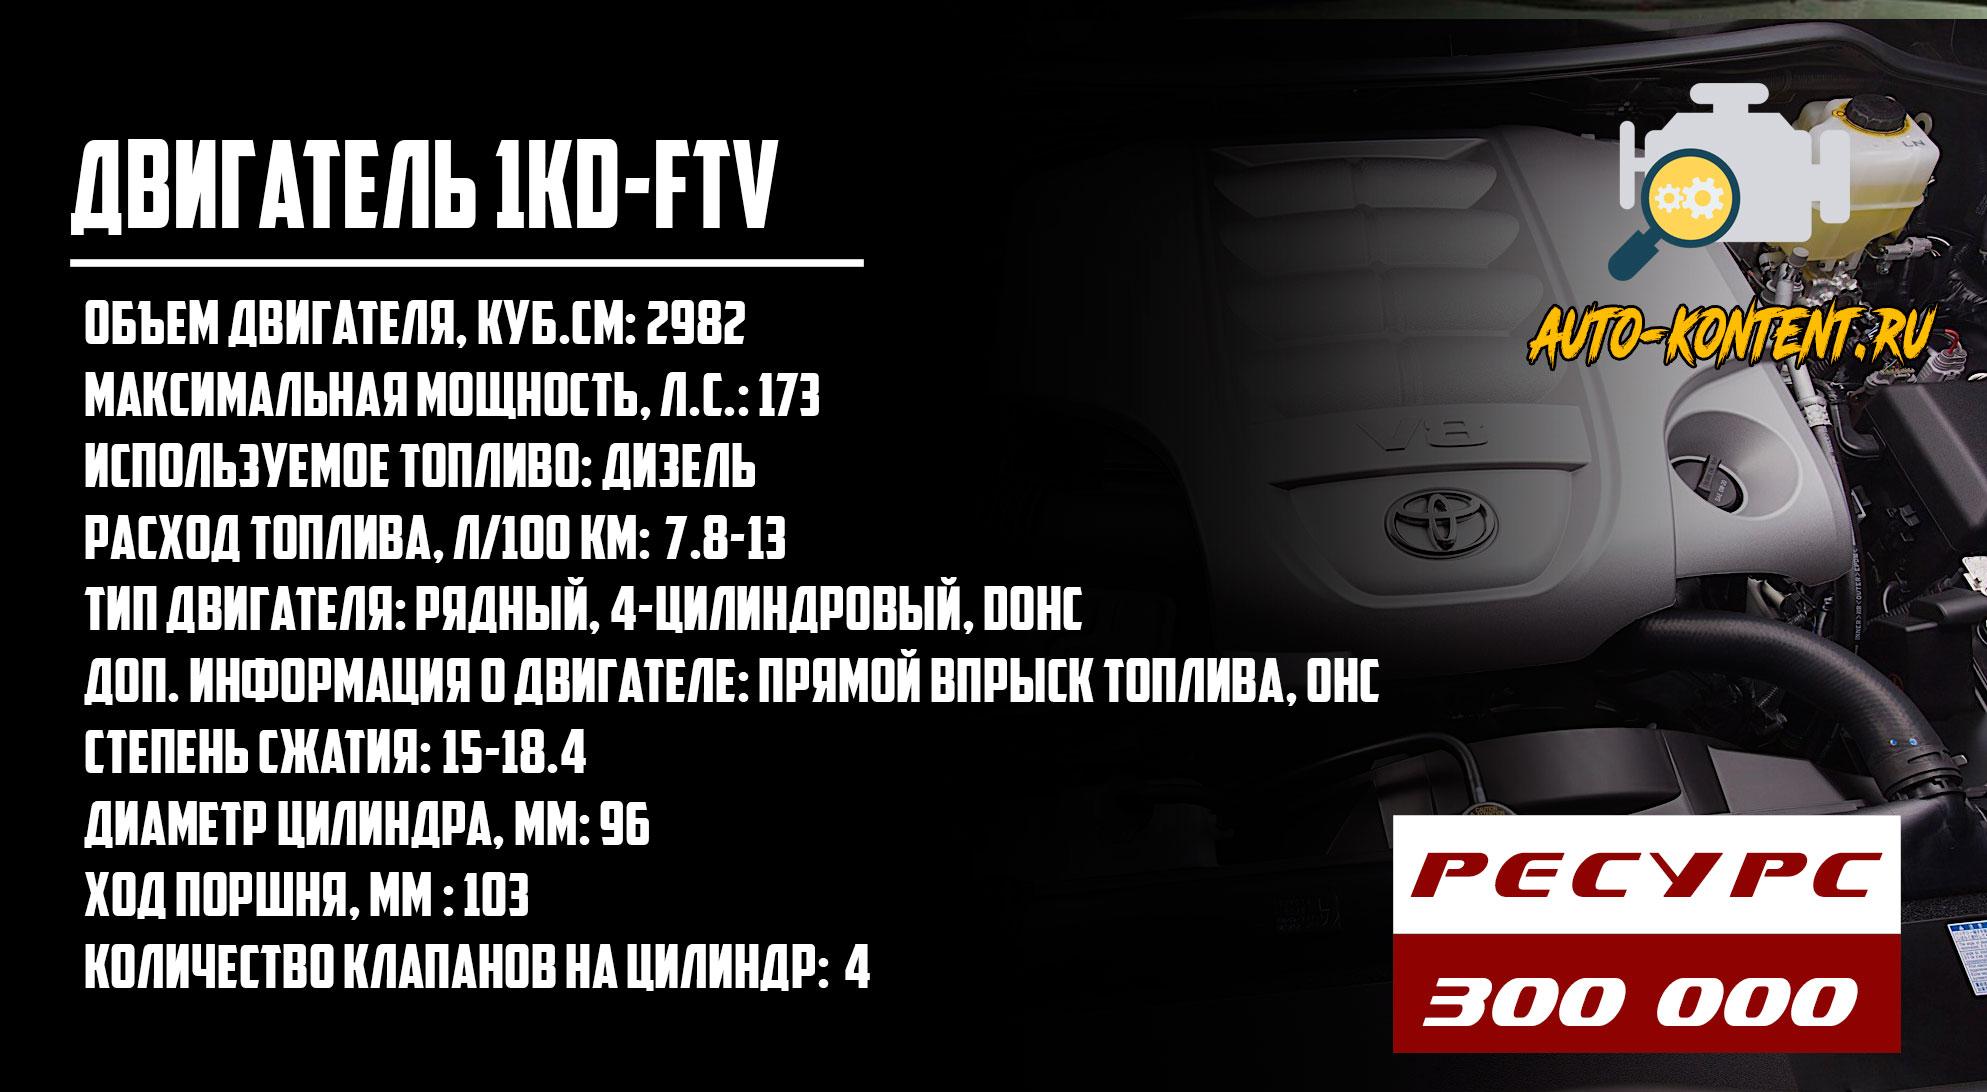 1KD-FTV